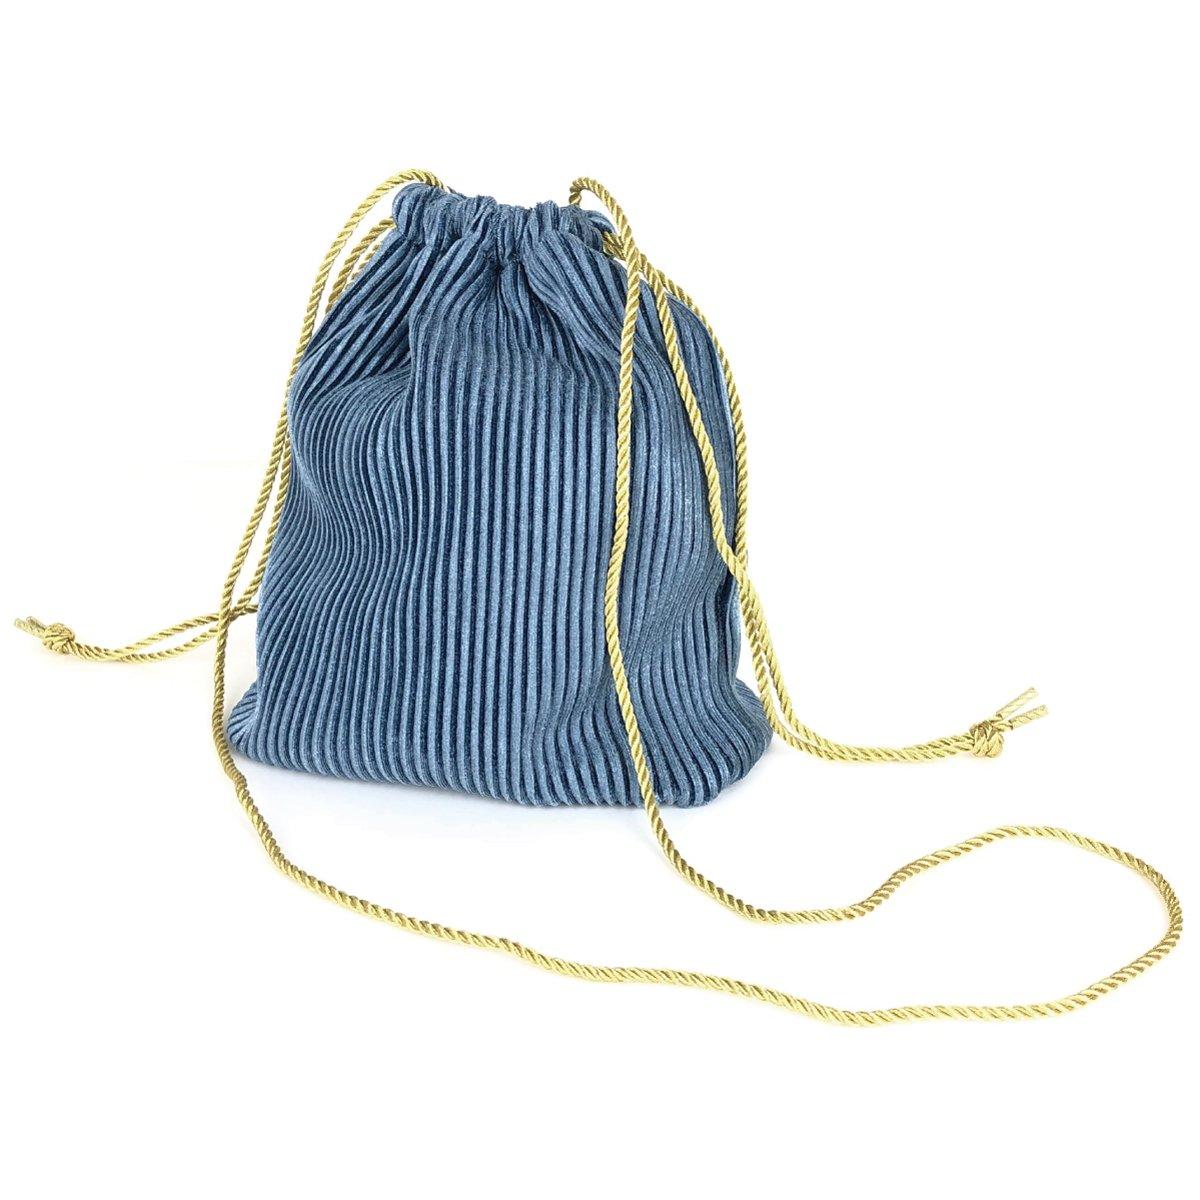 Classy Pleats Bag 詳細画像5